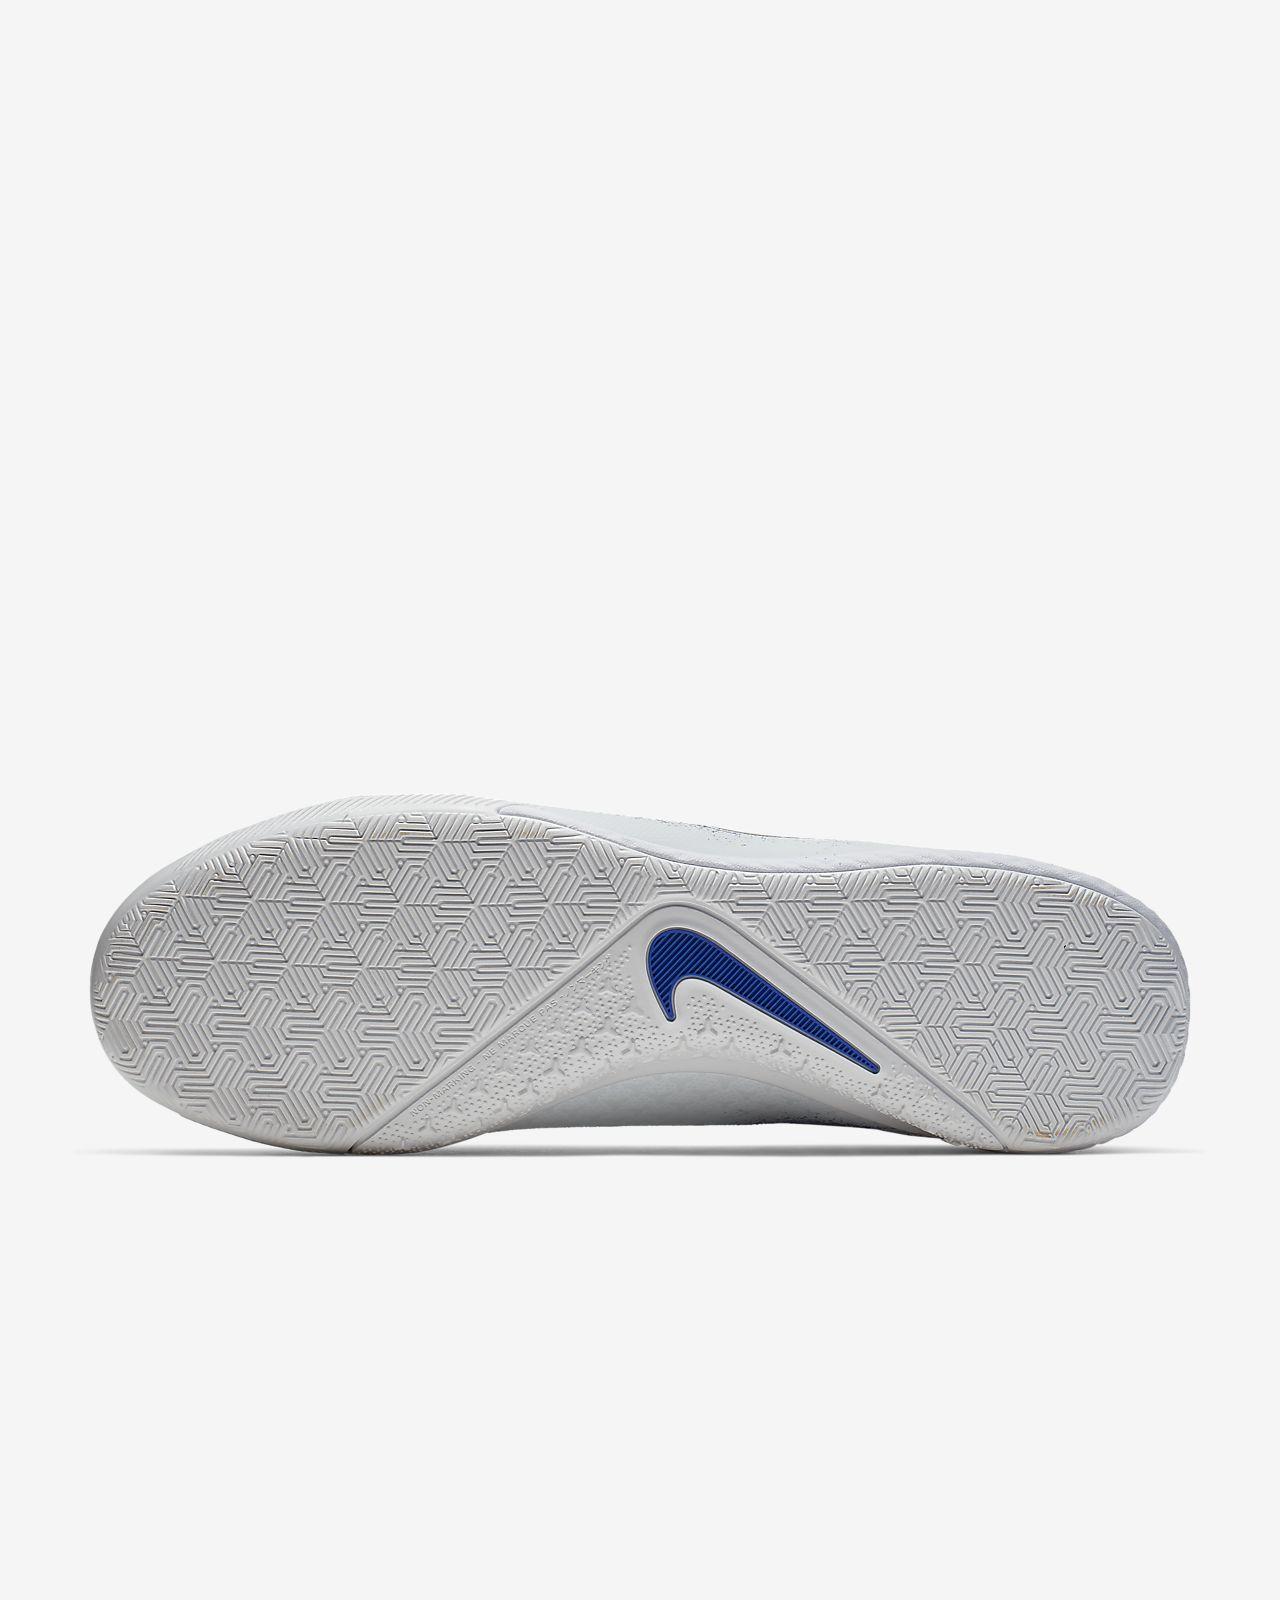 info for 56d99 0ac19 ... Zaalvoetbalschoen Nike React Phantom Vision Pro Dynamic Fit IC  Zaalvoetbalschoen